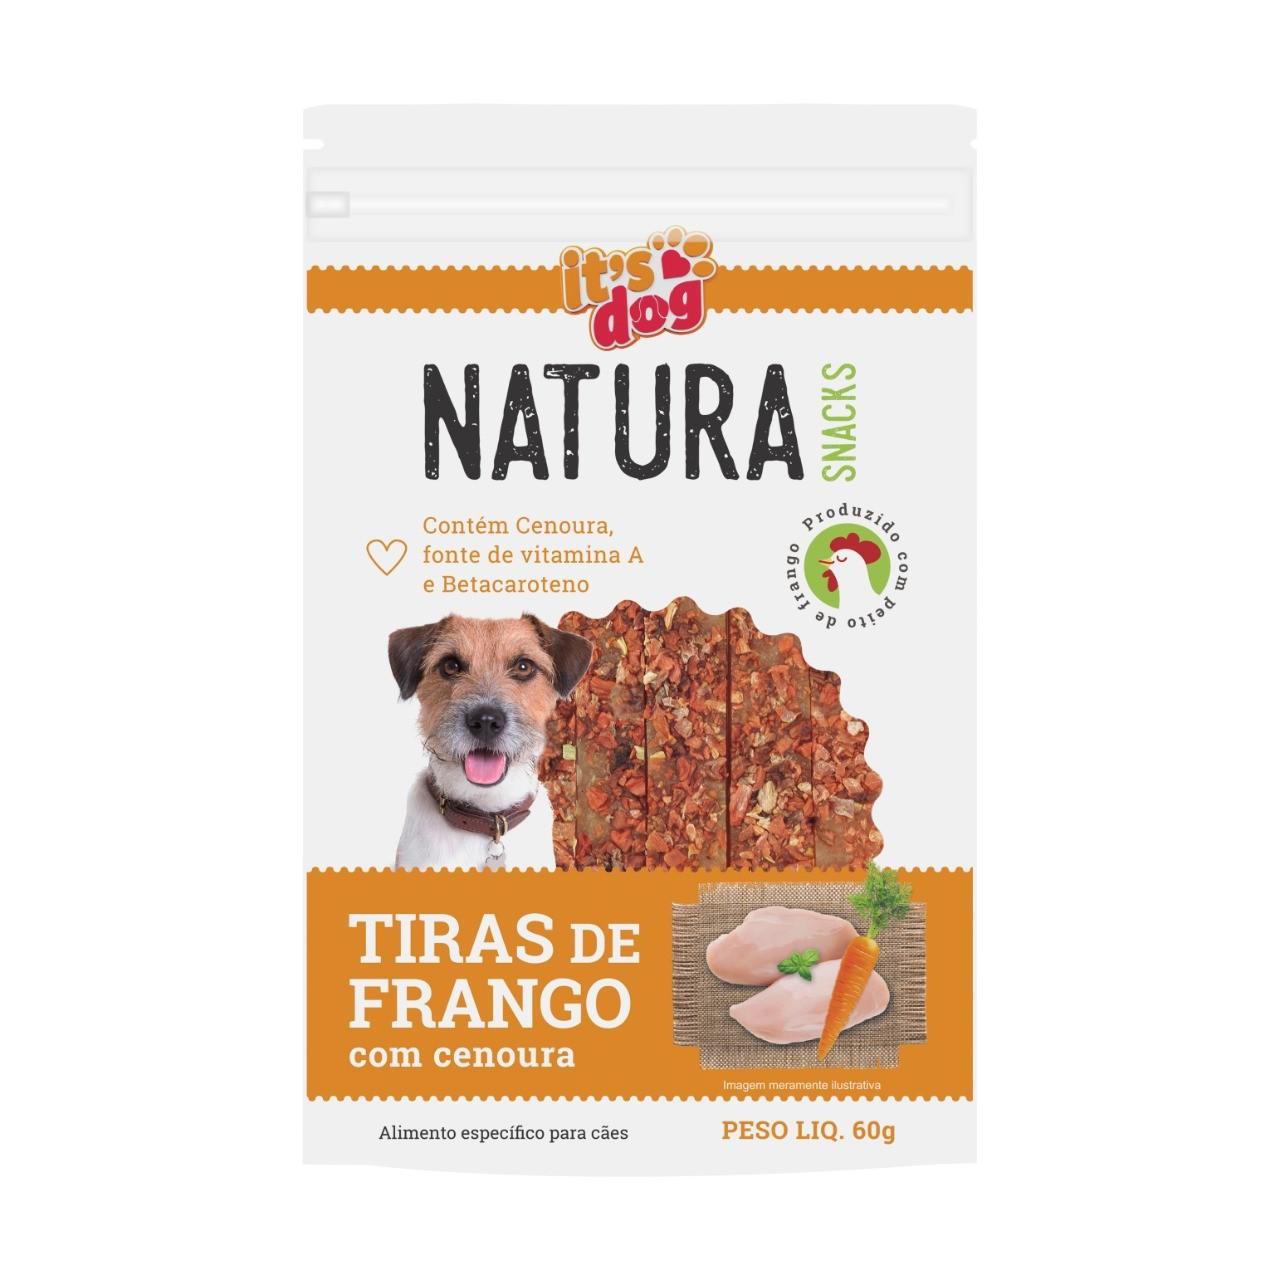 Snack Natura Tiras de Frango e Cenoura Desitratada 100% Natural - 60g